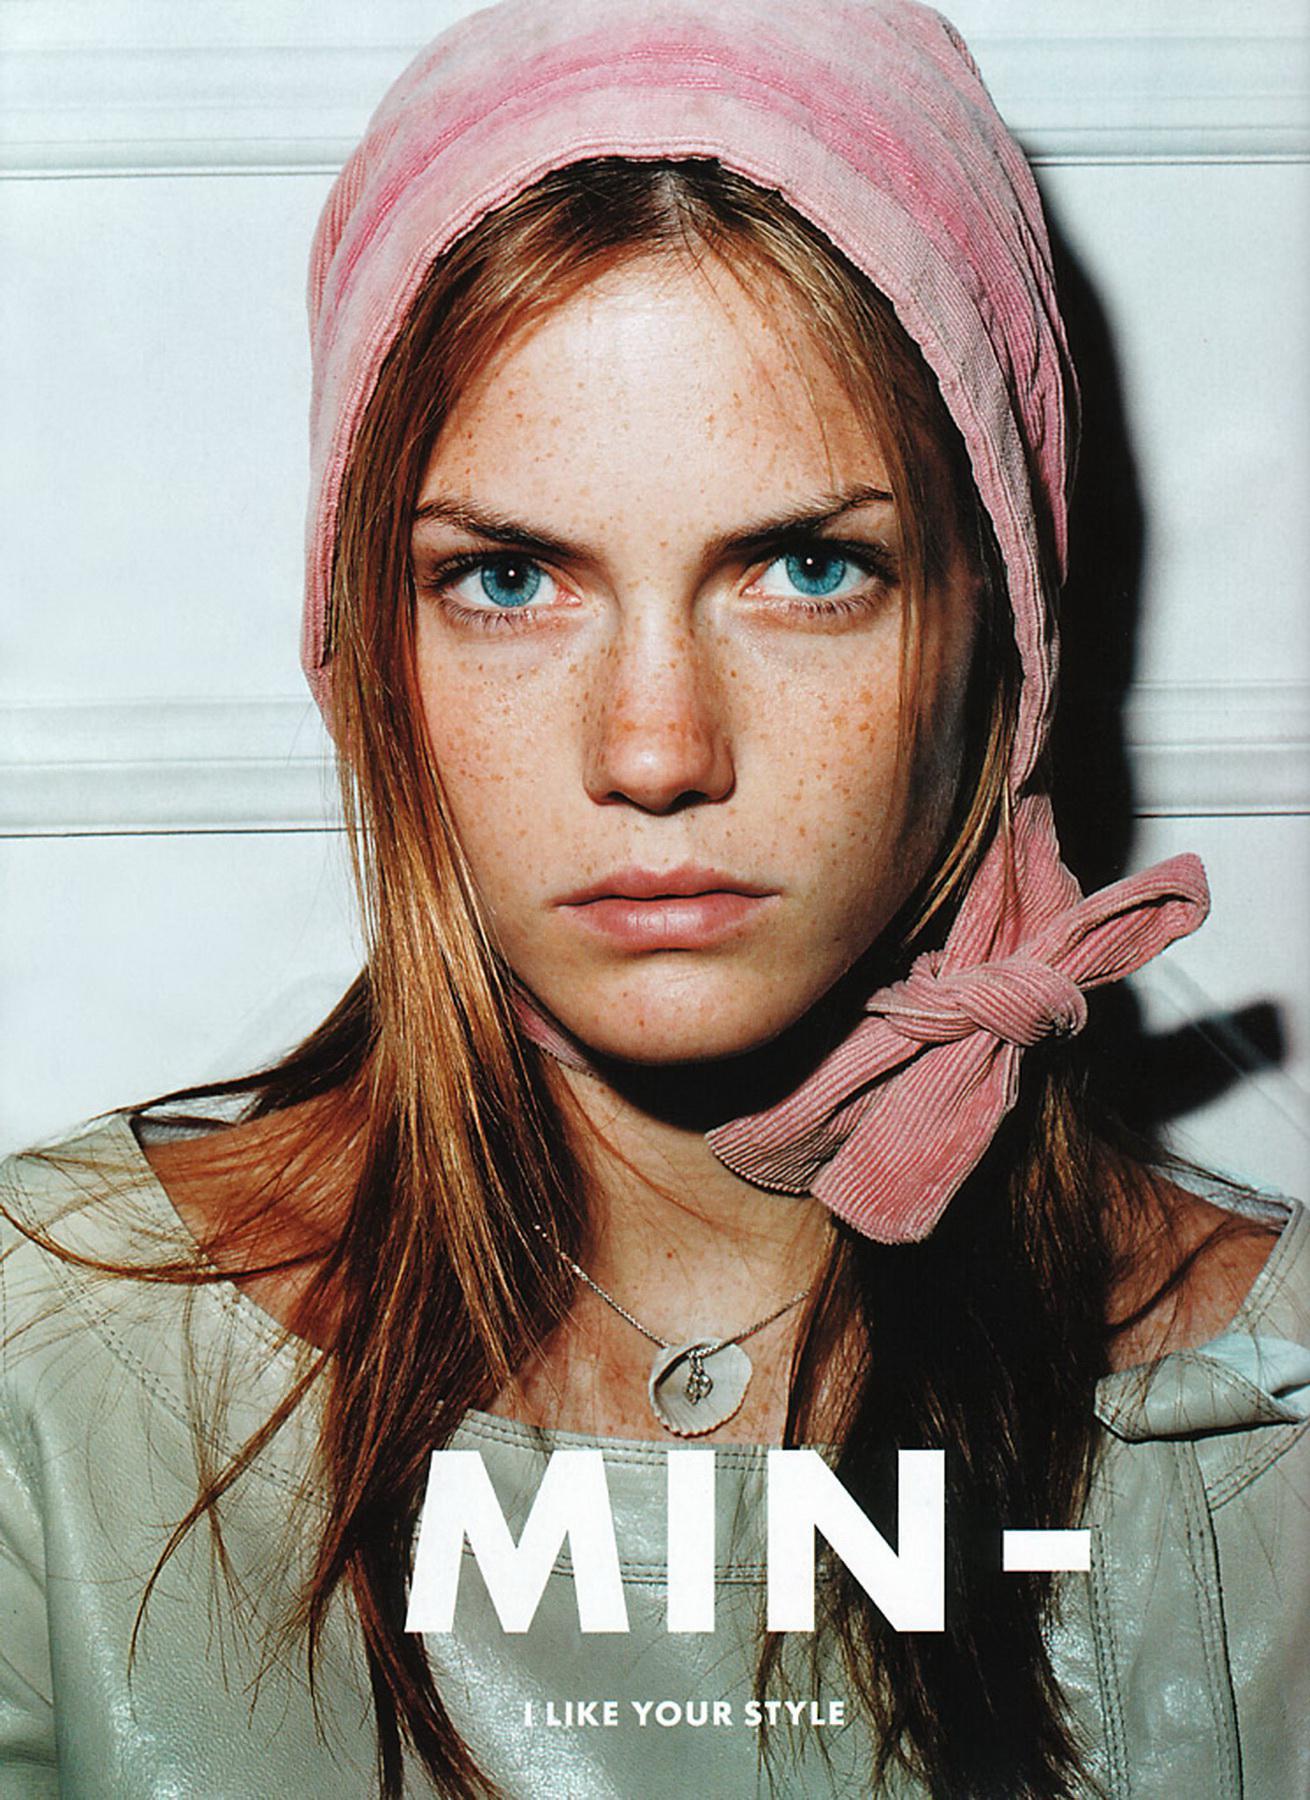 Mini Anden nue, 105 Photos, biographie, news de stars